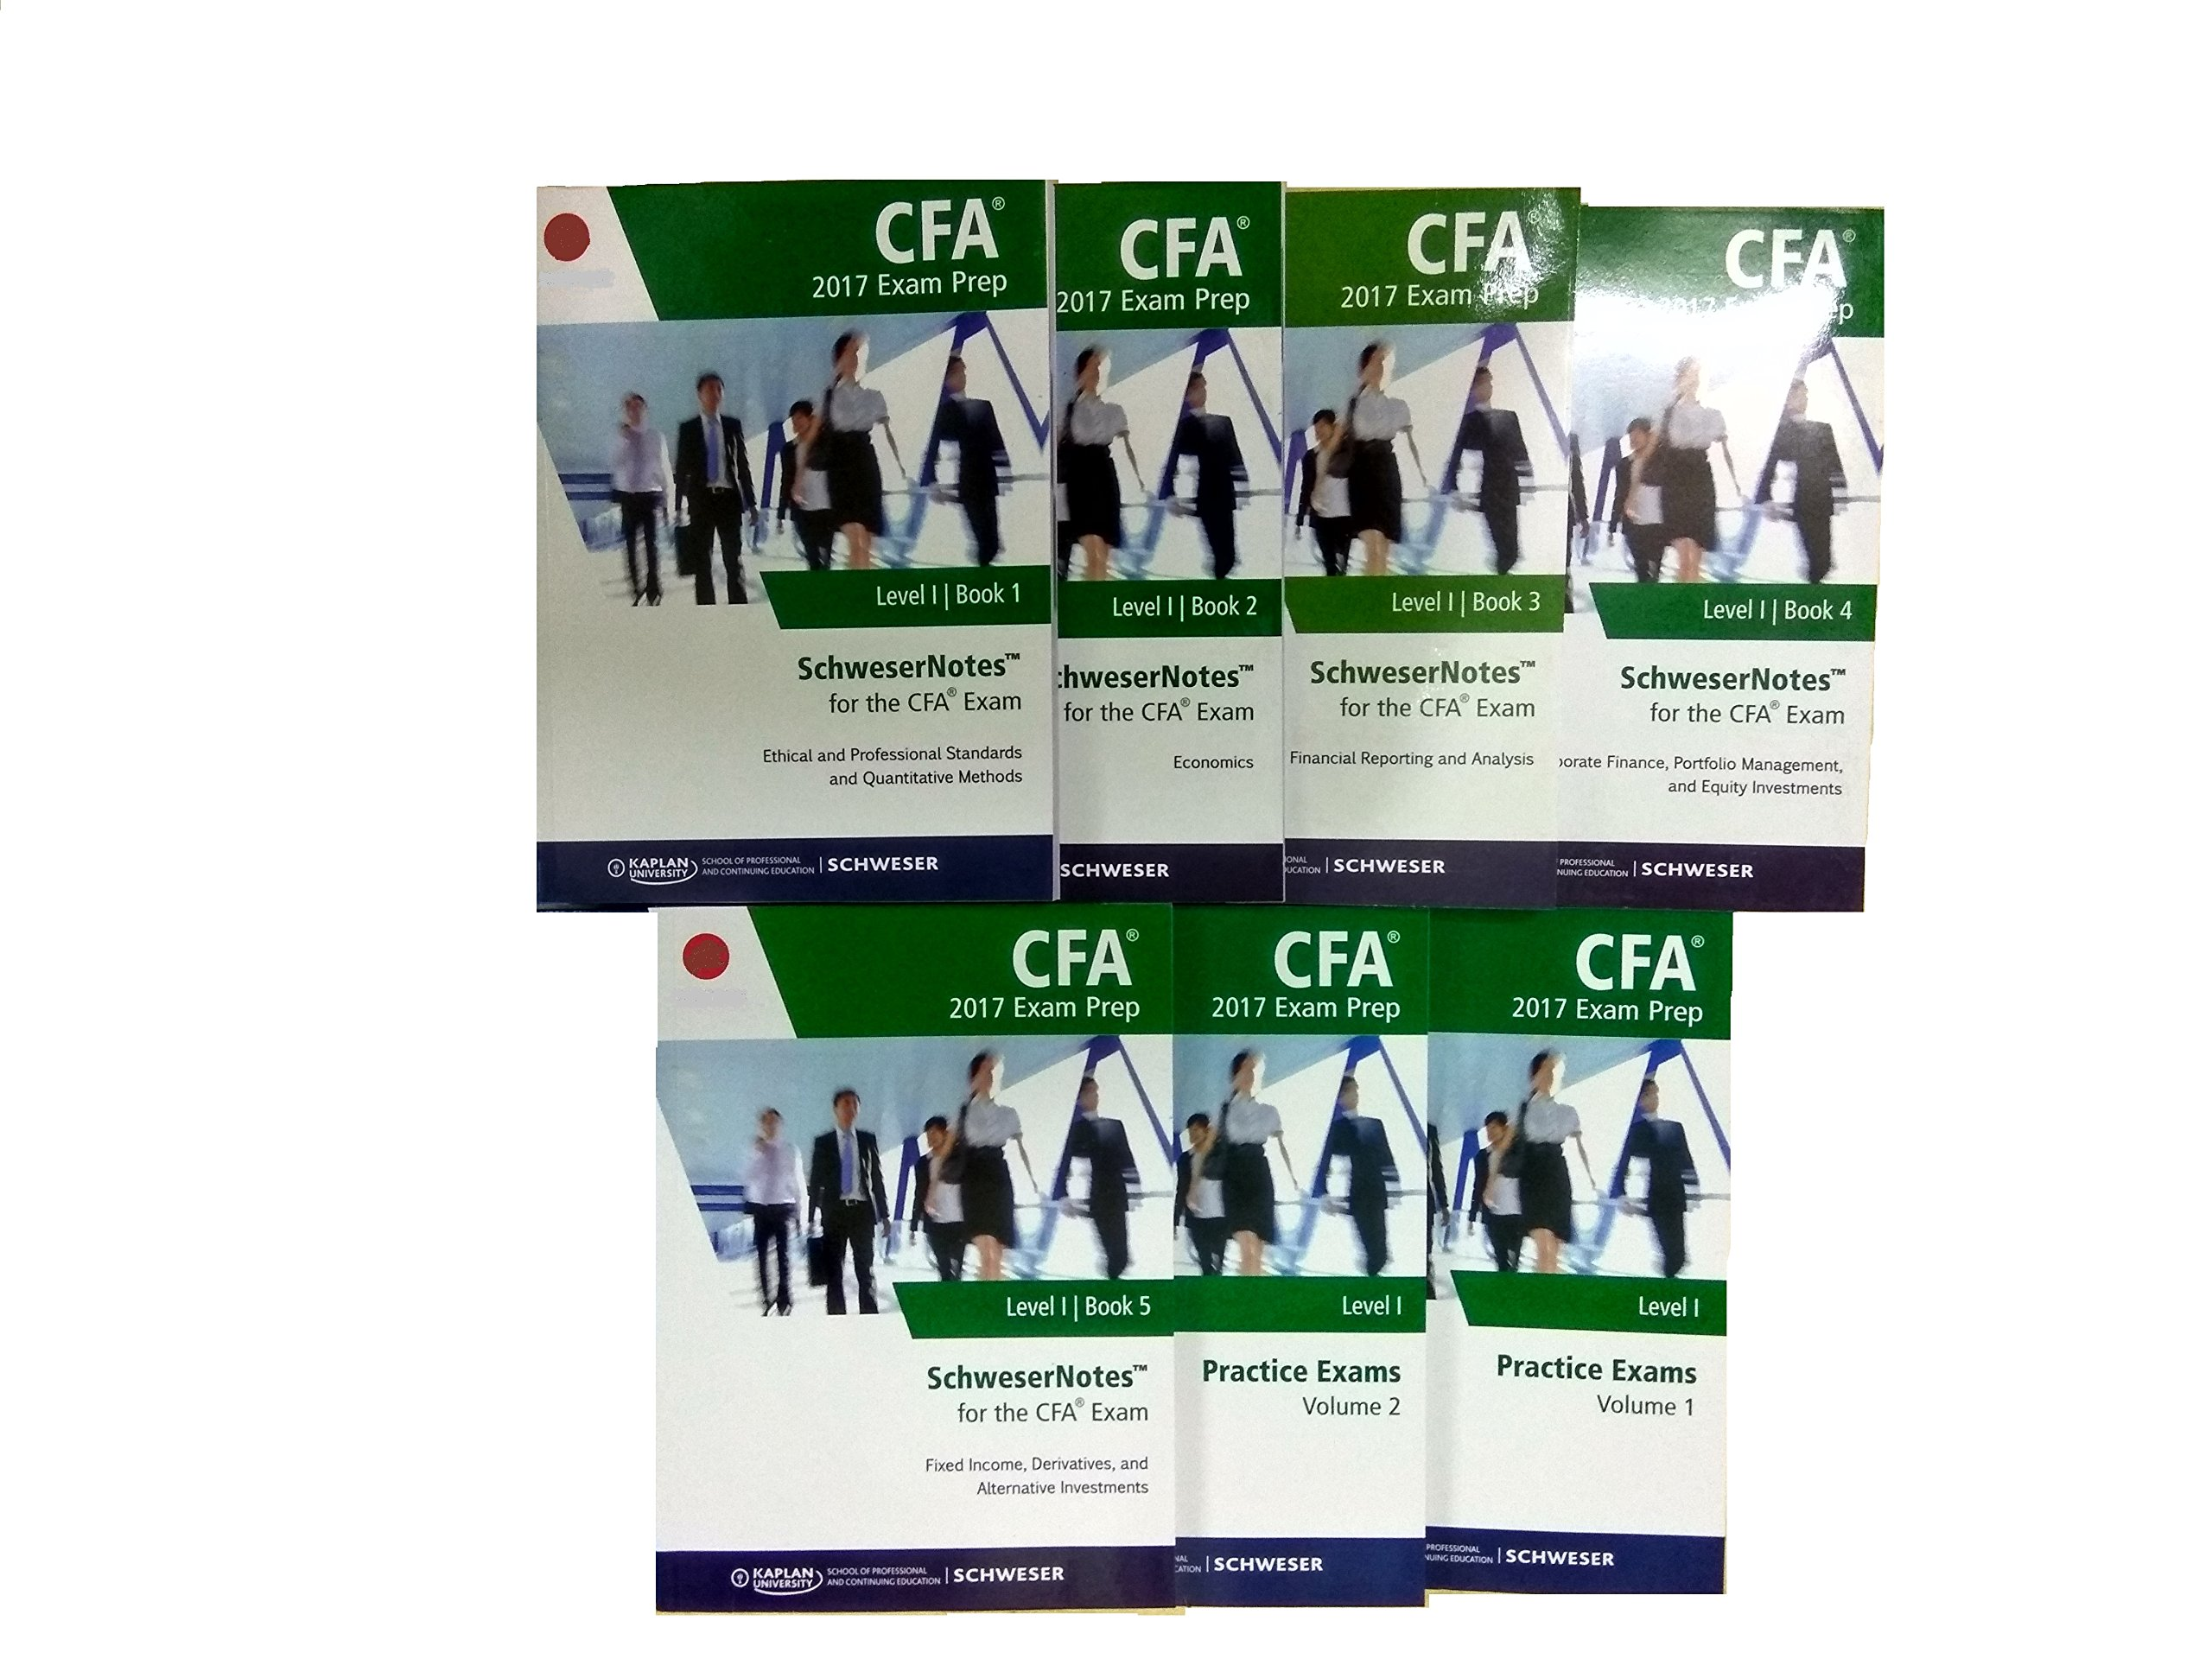 Cfa scheweser 2015 level 1 studynotes payhip.